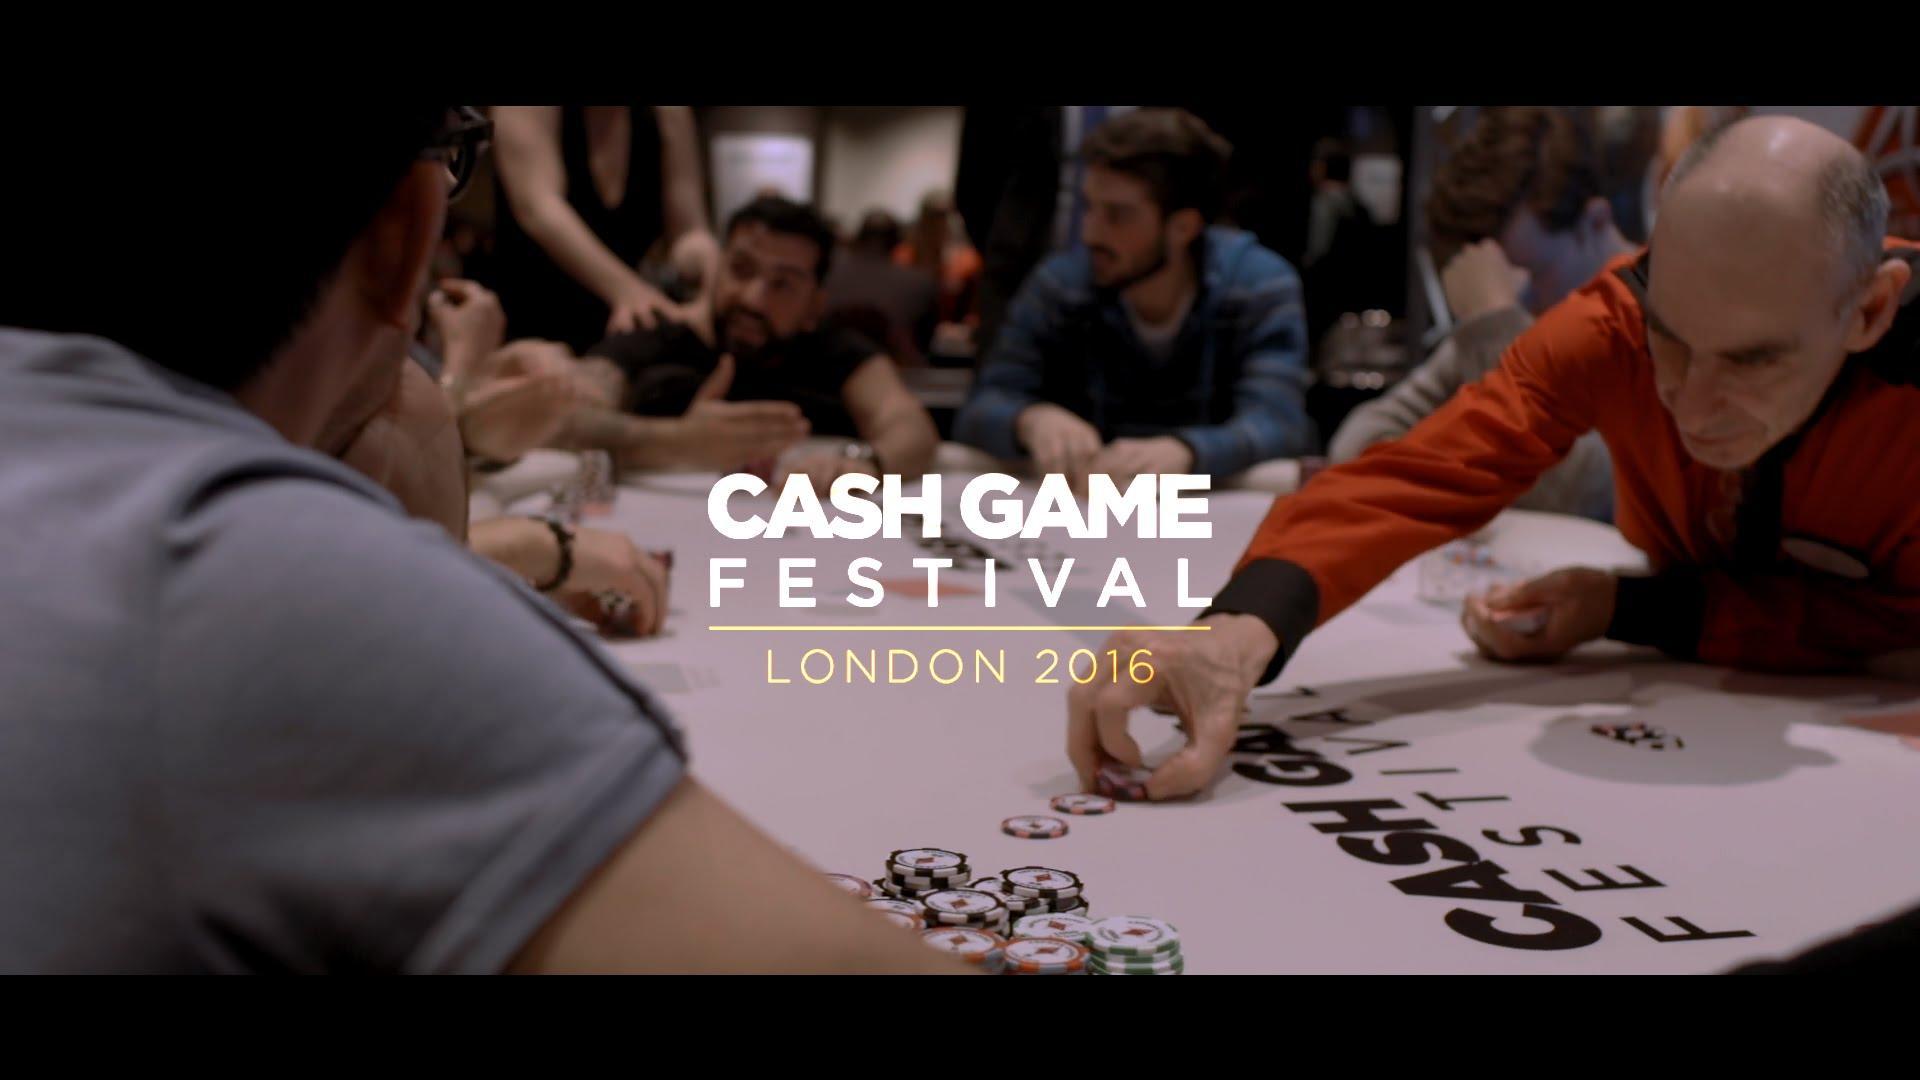 London Cash Game Festival 2016 - Aftermovie